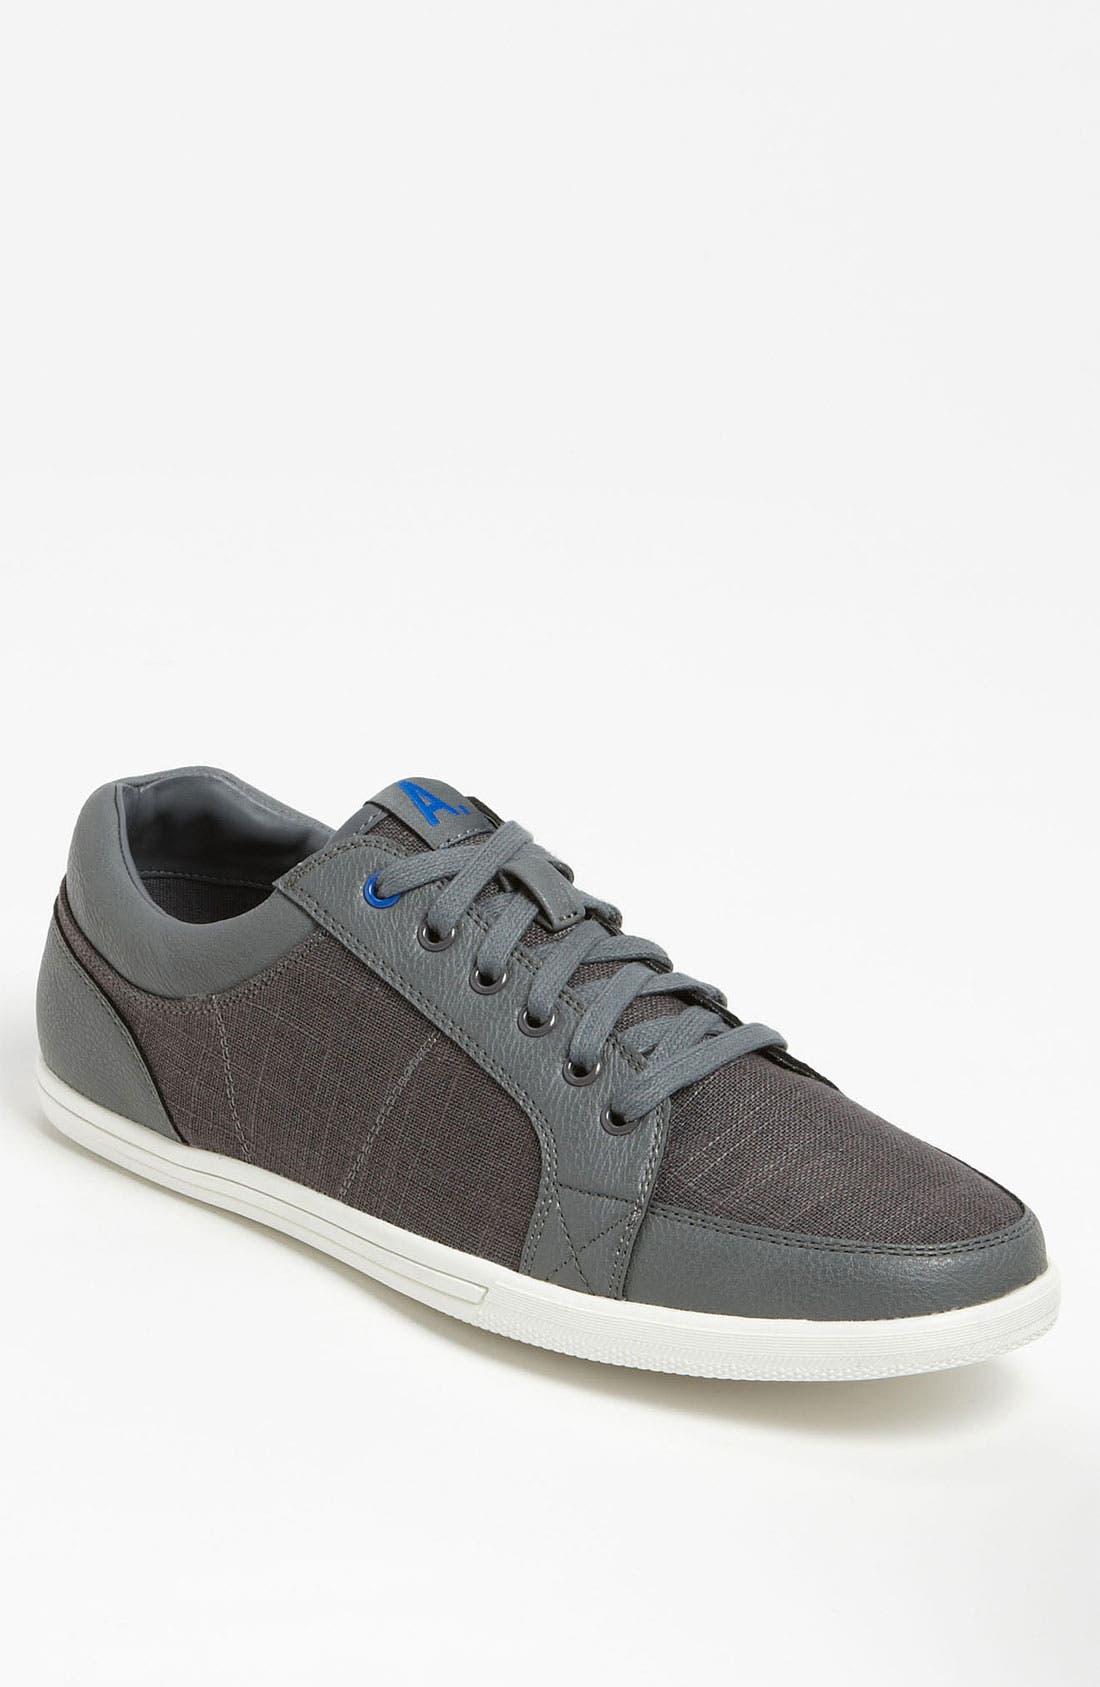 Main Image - ALDO 'Ensor' Sneaker